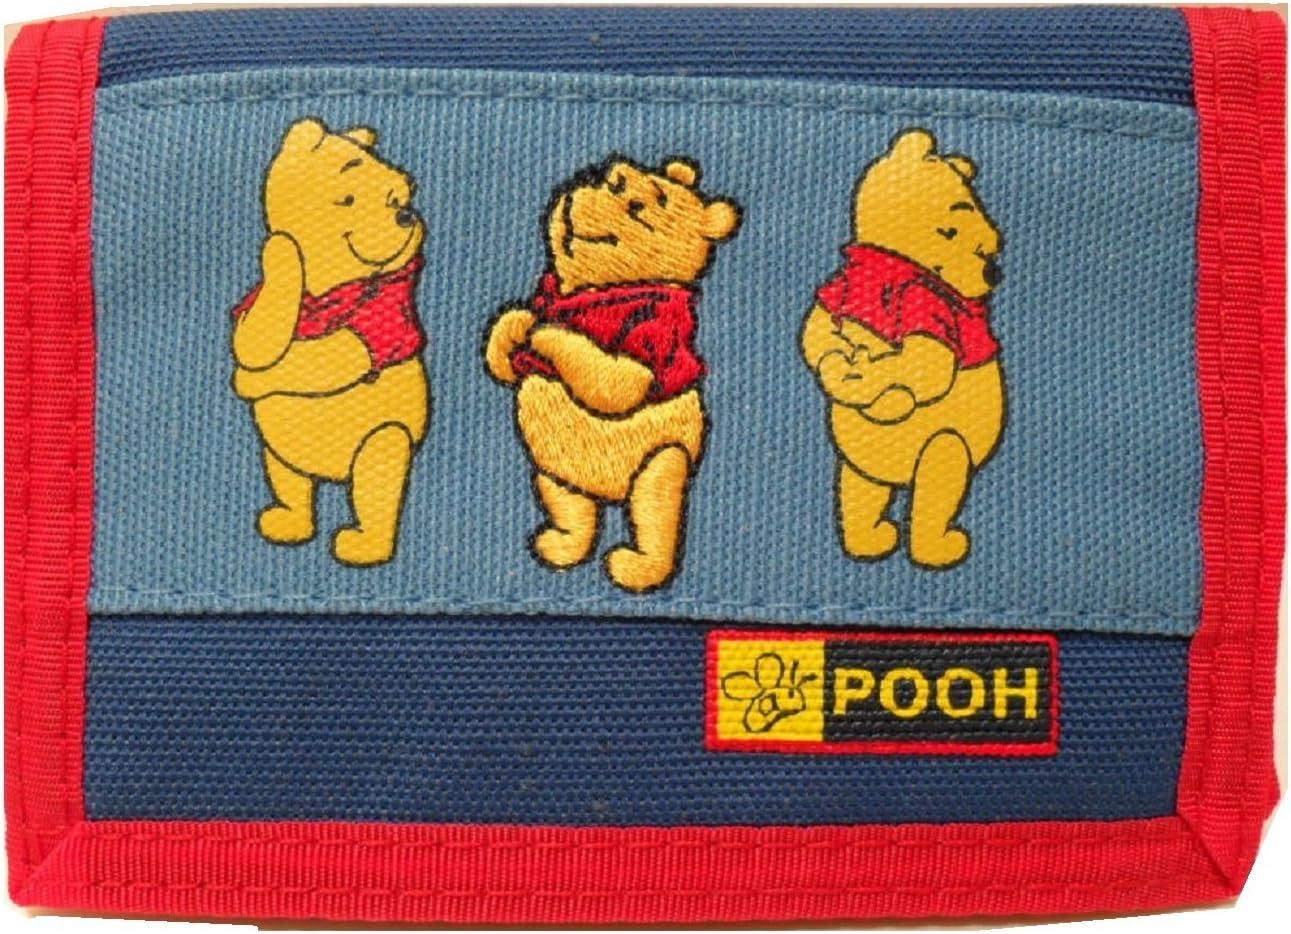 Disney Winnie the Pooh Wallet